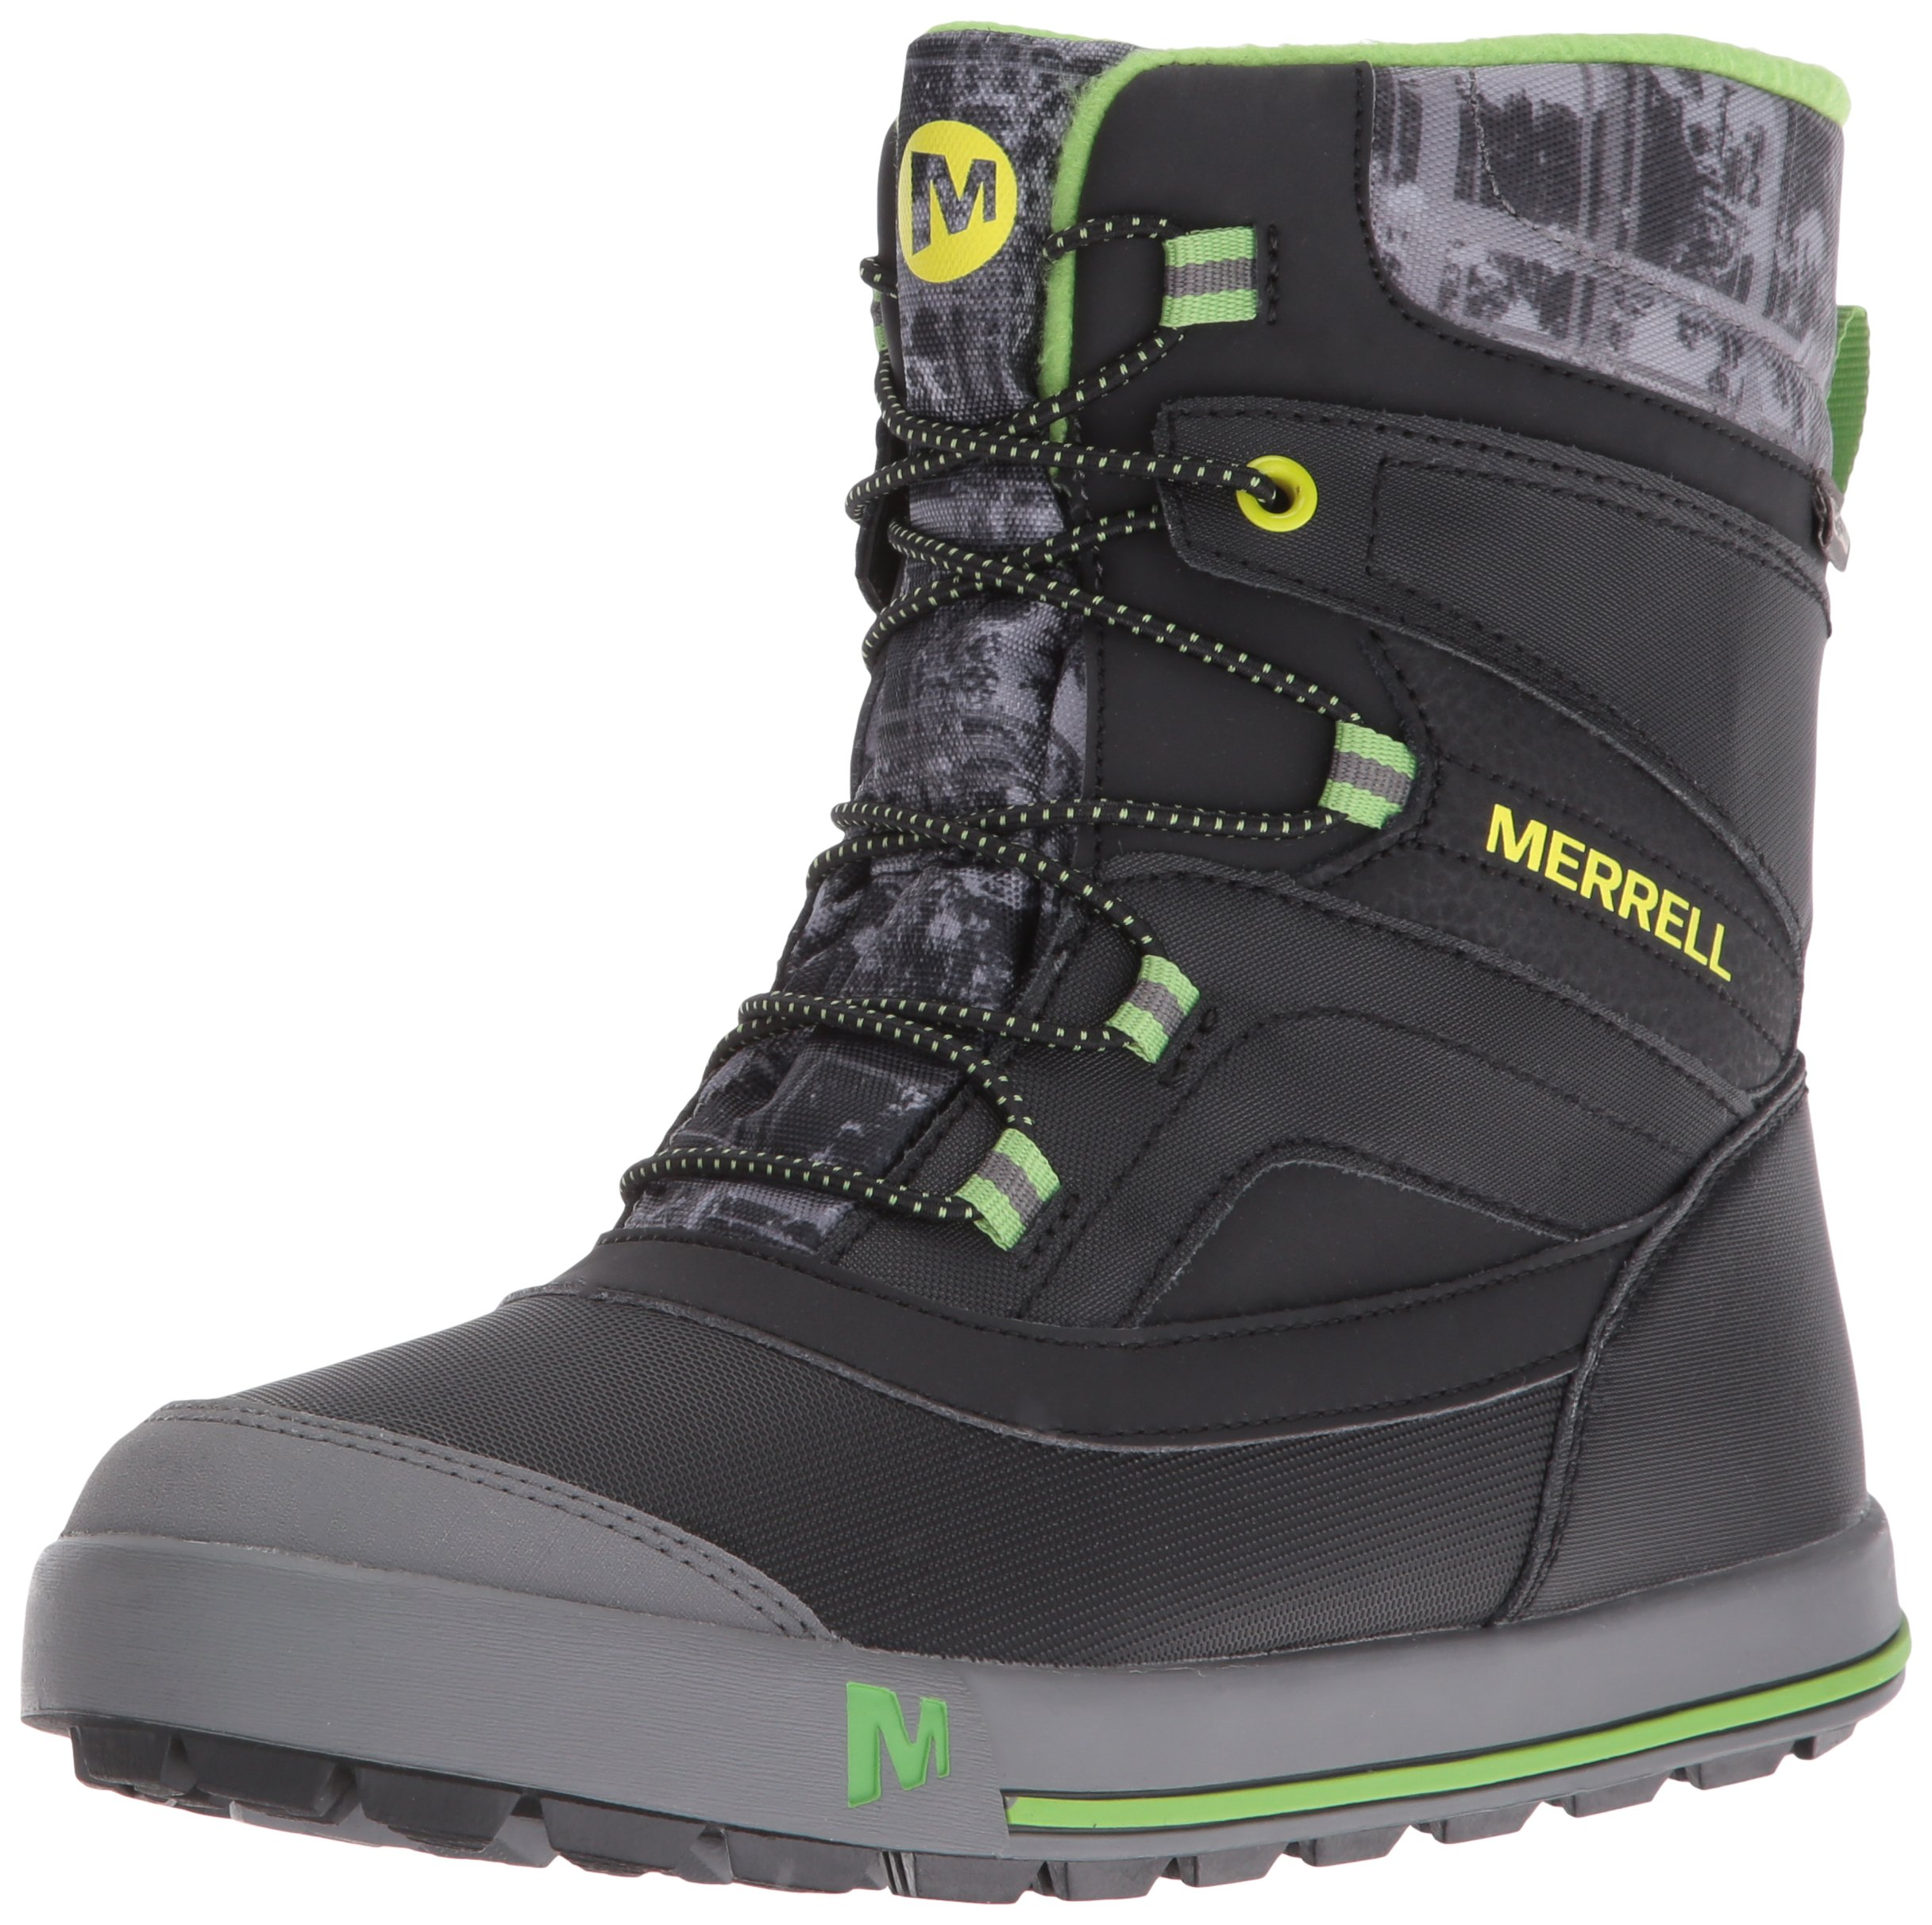 b791bb31f0 Cheap Merrell Snow Boot, find Merrell Snow Boot deals on line at ...